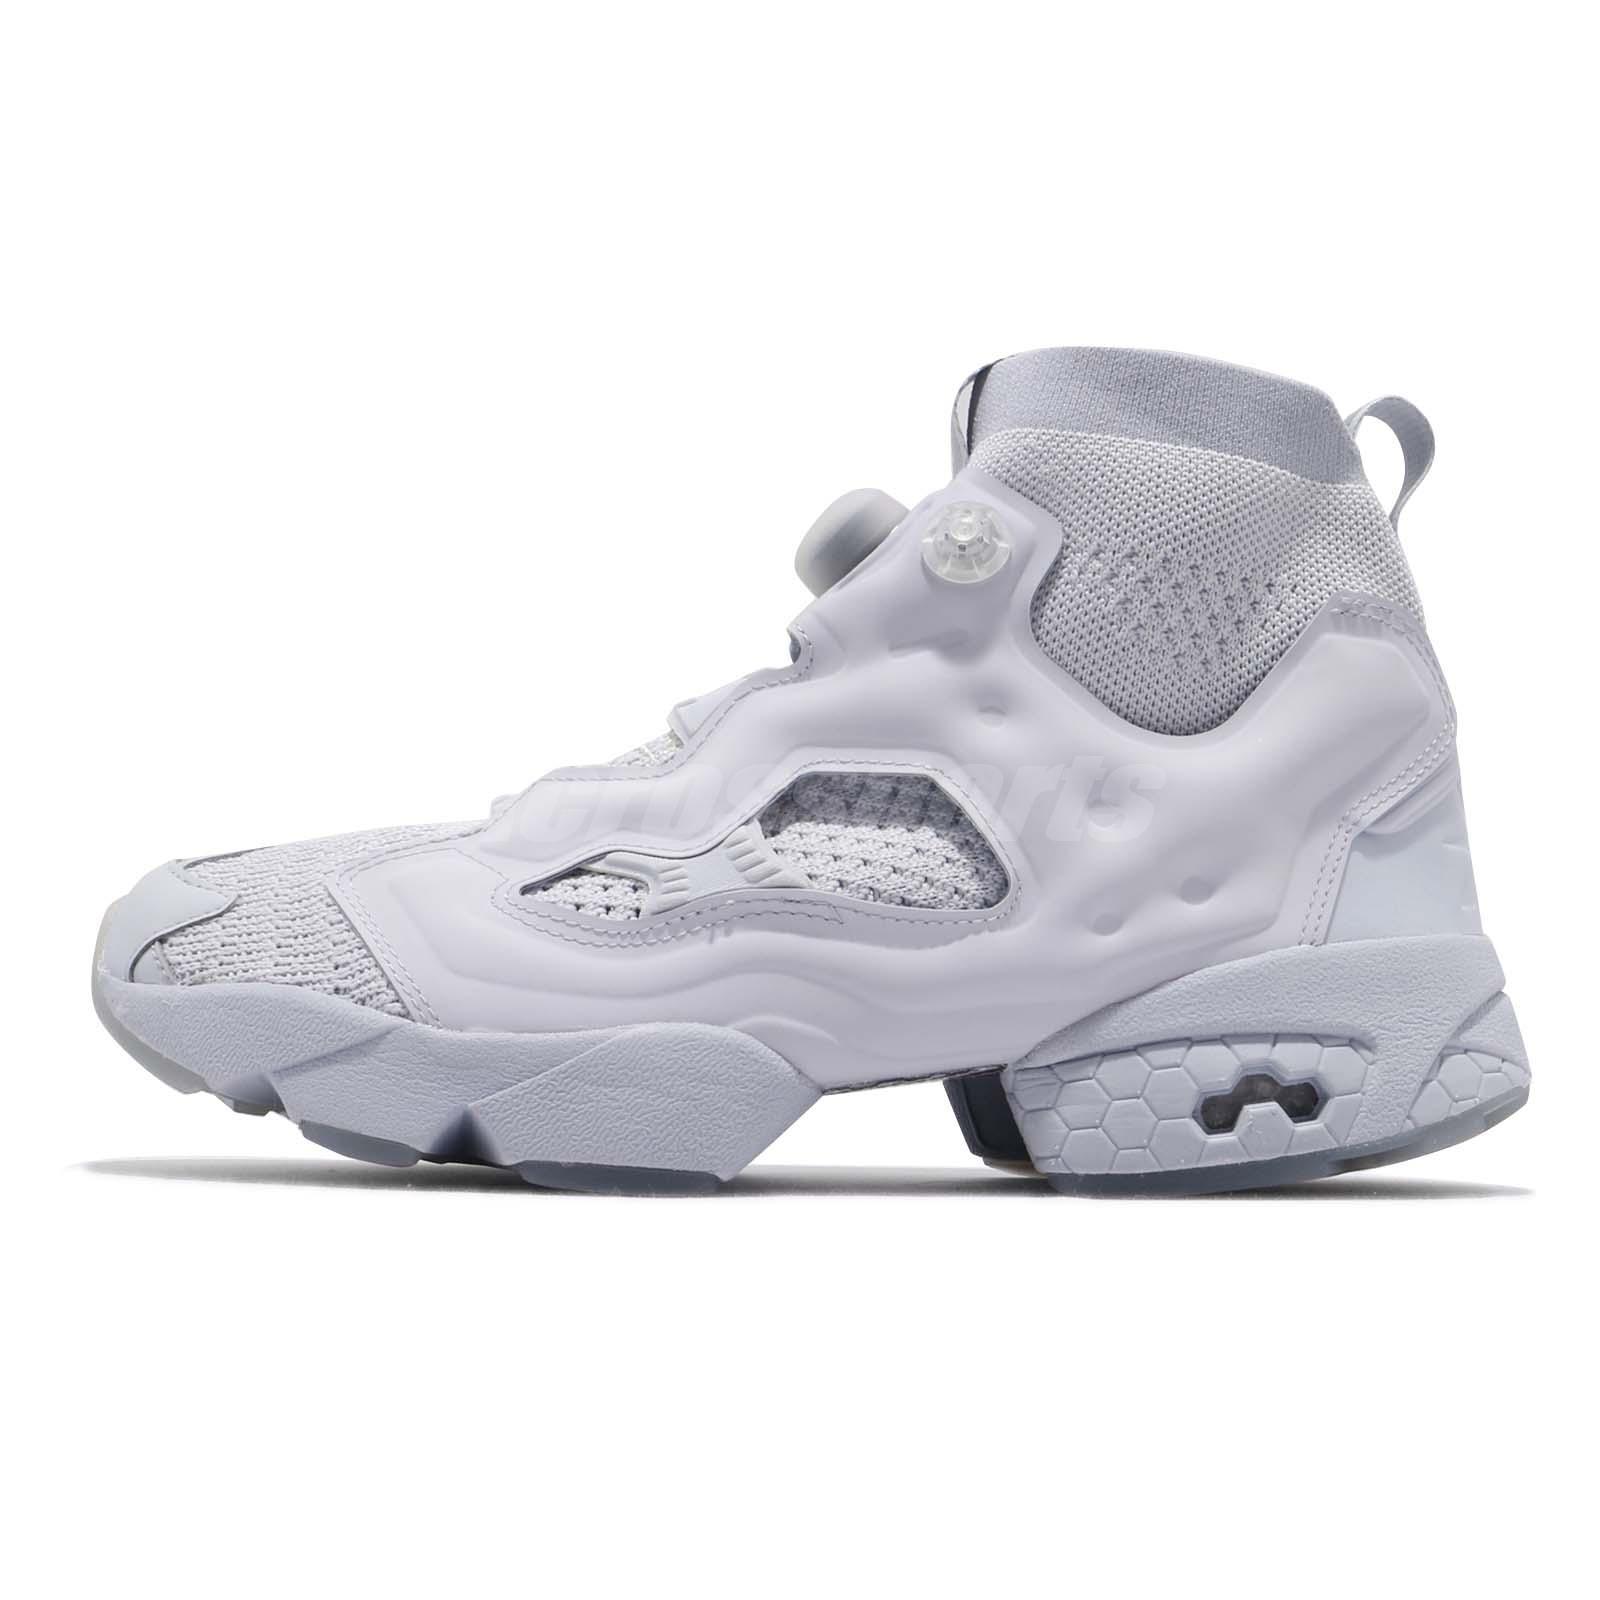 78d11c13e770 Reebok InstaPump Fury OG ULTK Ultraknit Grey Men Lifestyle Shoes Sneakers  CN3799